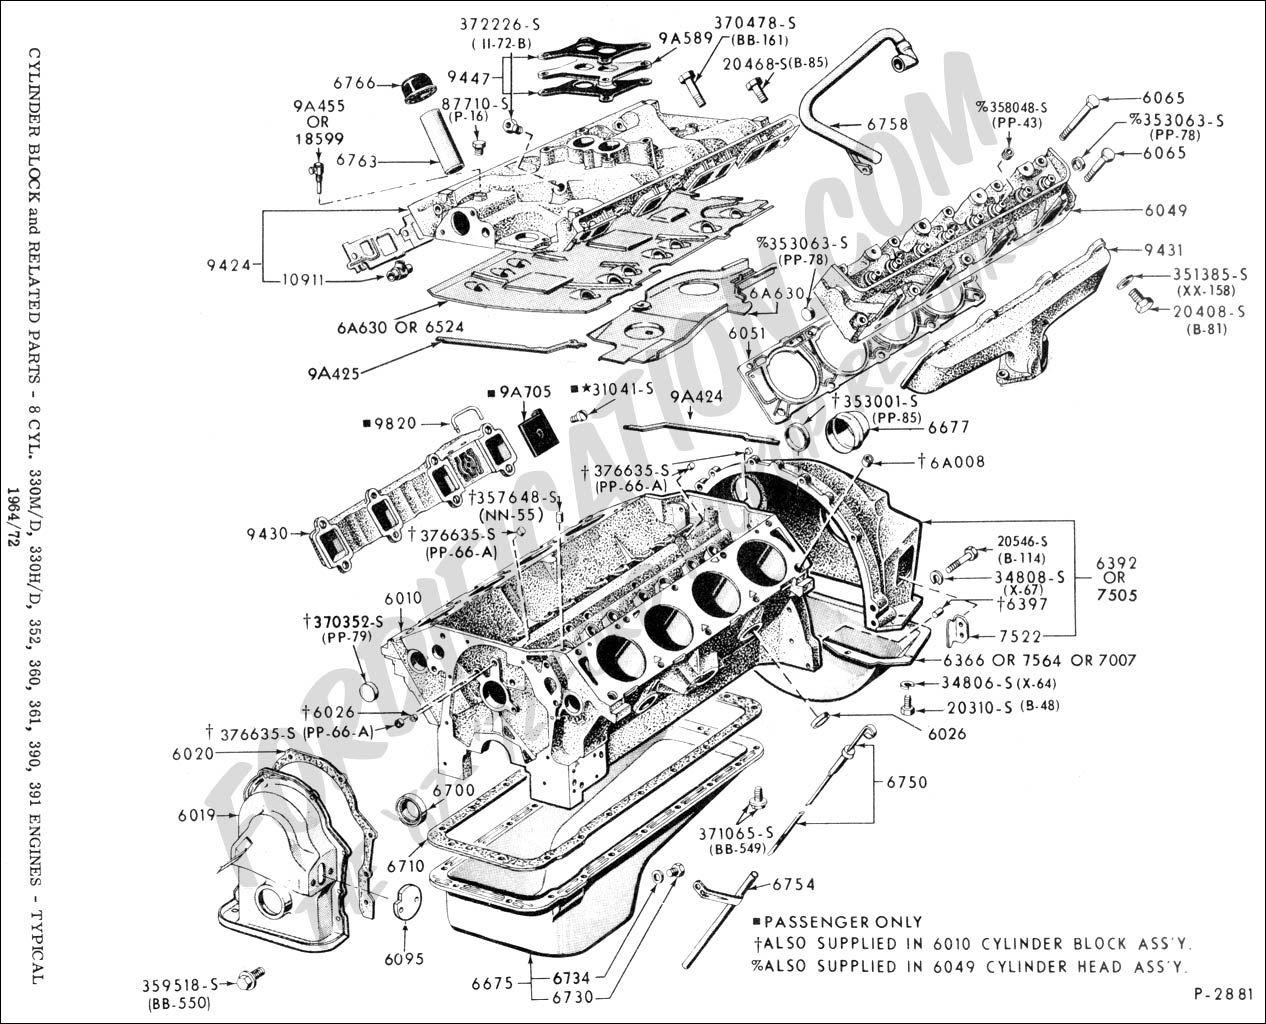 352 ford engine diagram [ 1266 x 1024 Pixel ]